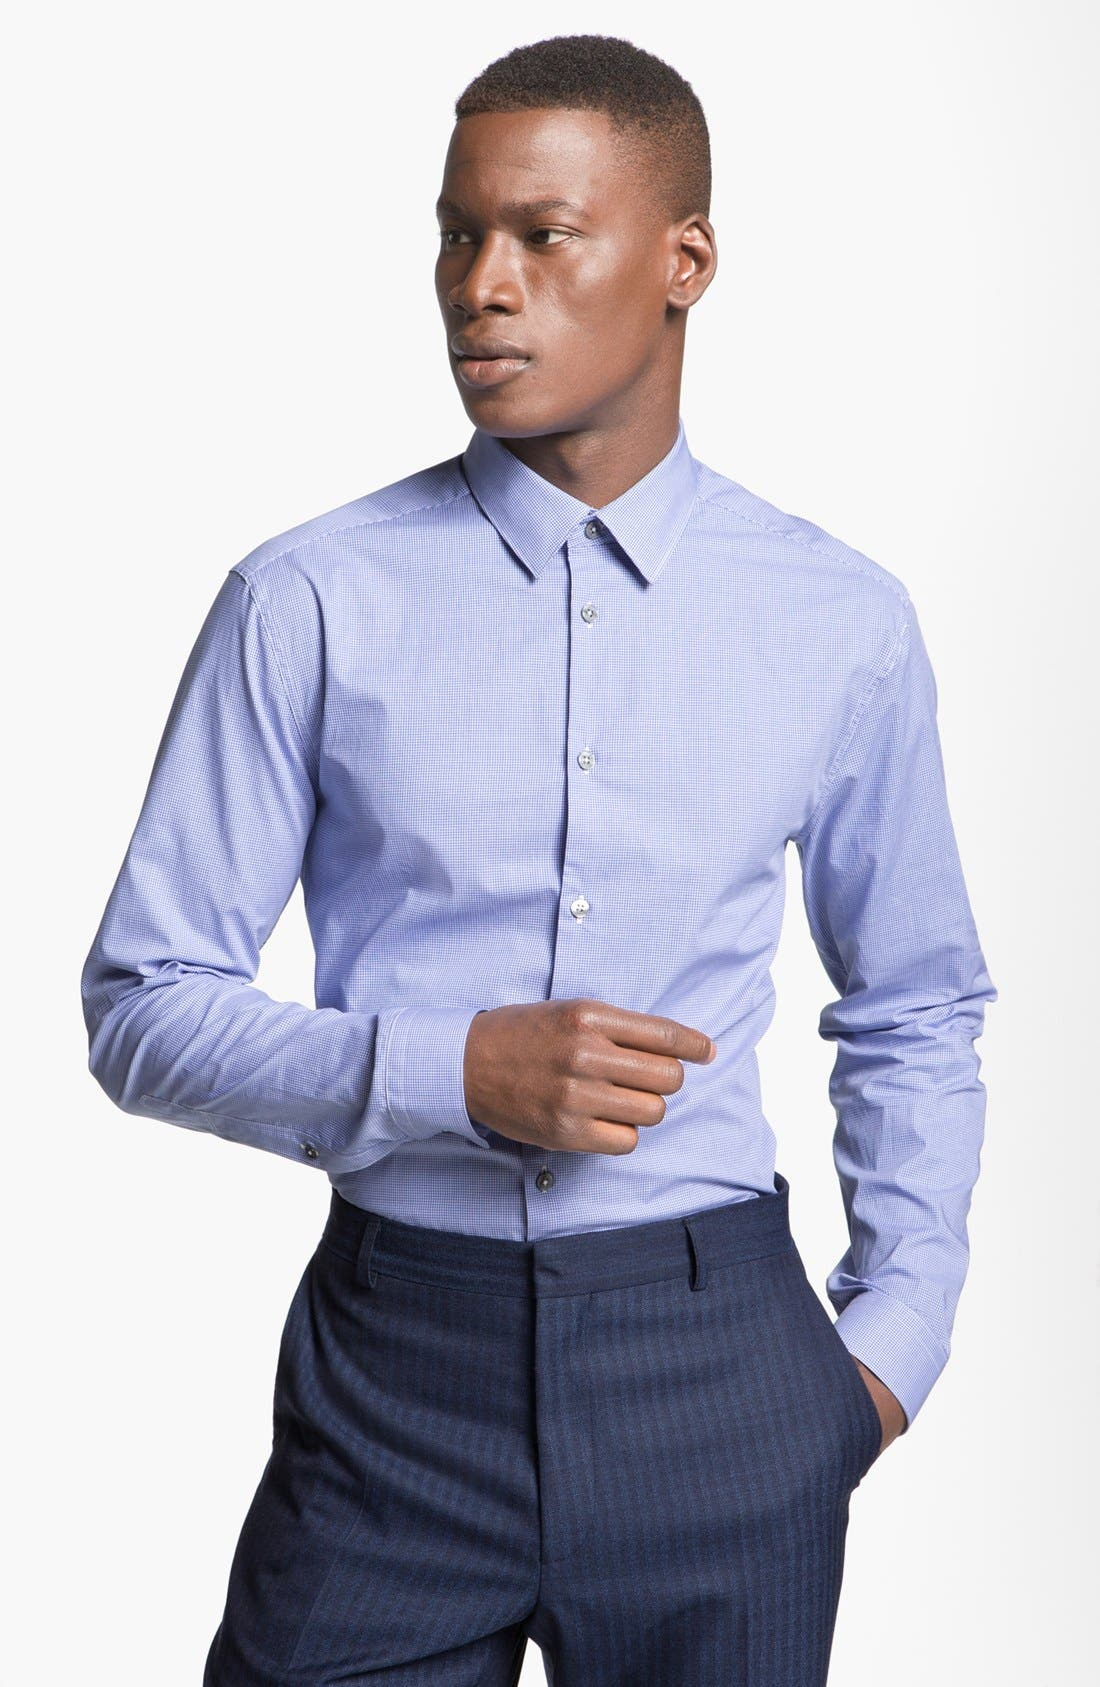 Alternate Image 1 Selected - Paul Smith London Slim Fit Microcheck Dress Shirt